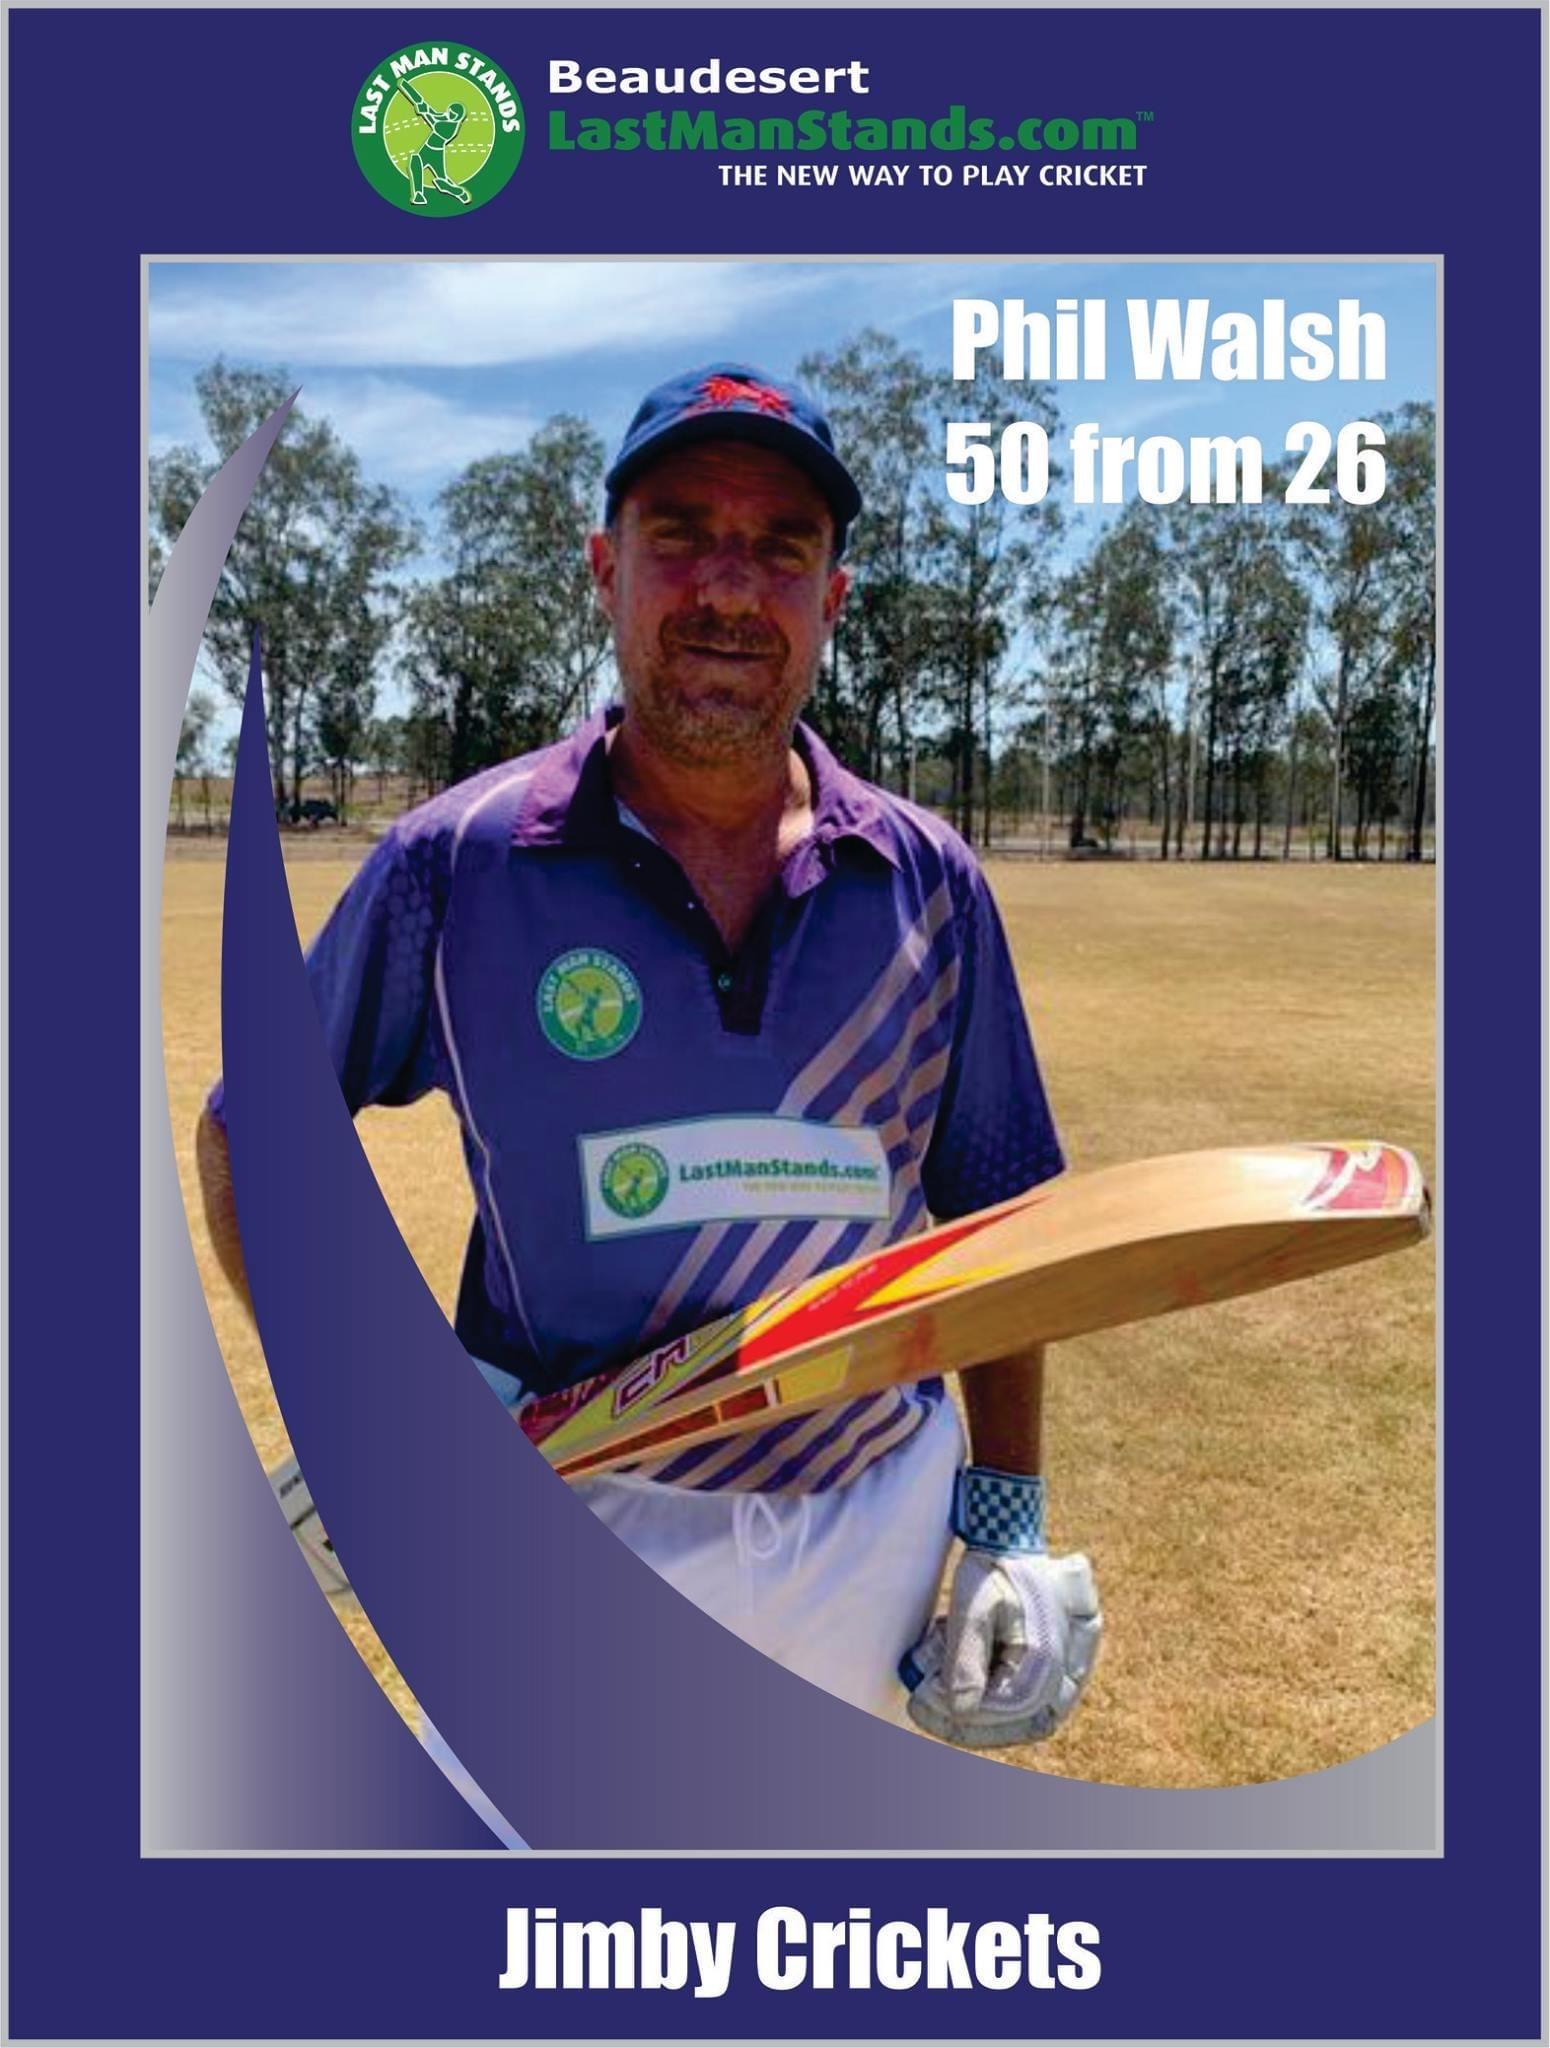 Phil Walsh